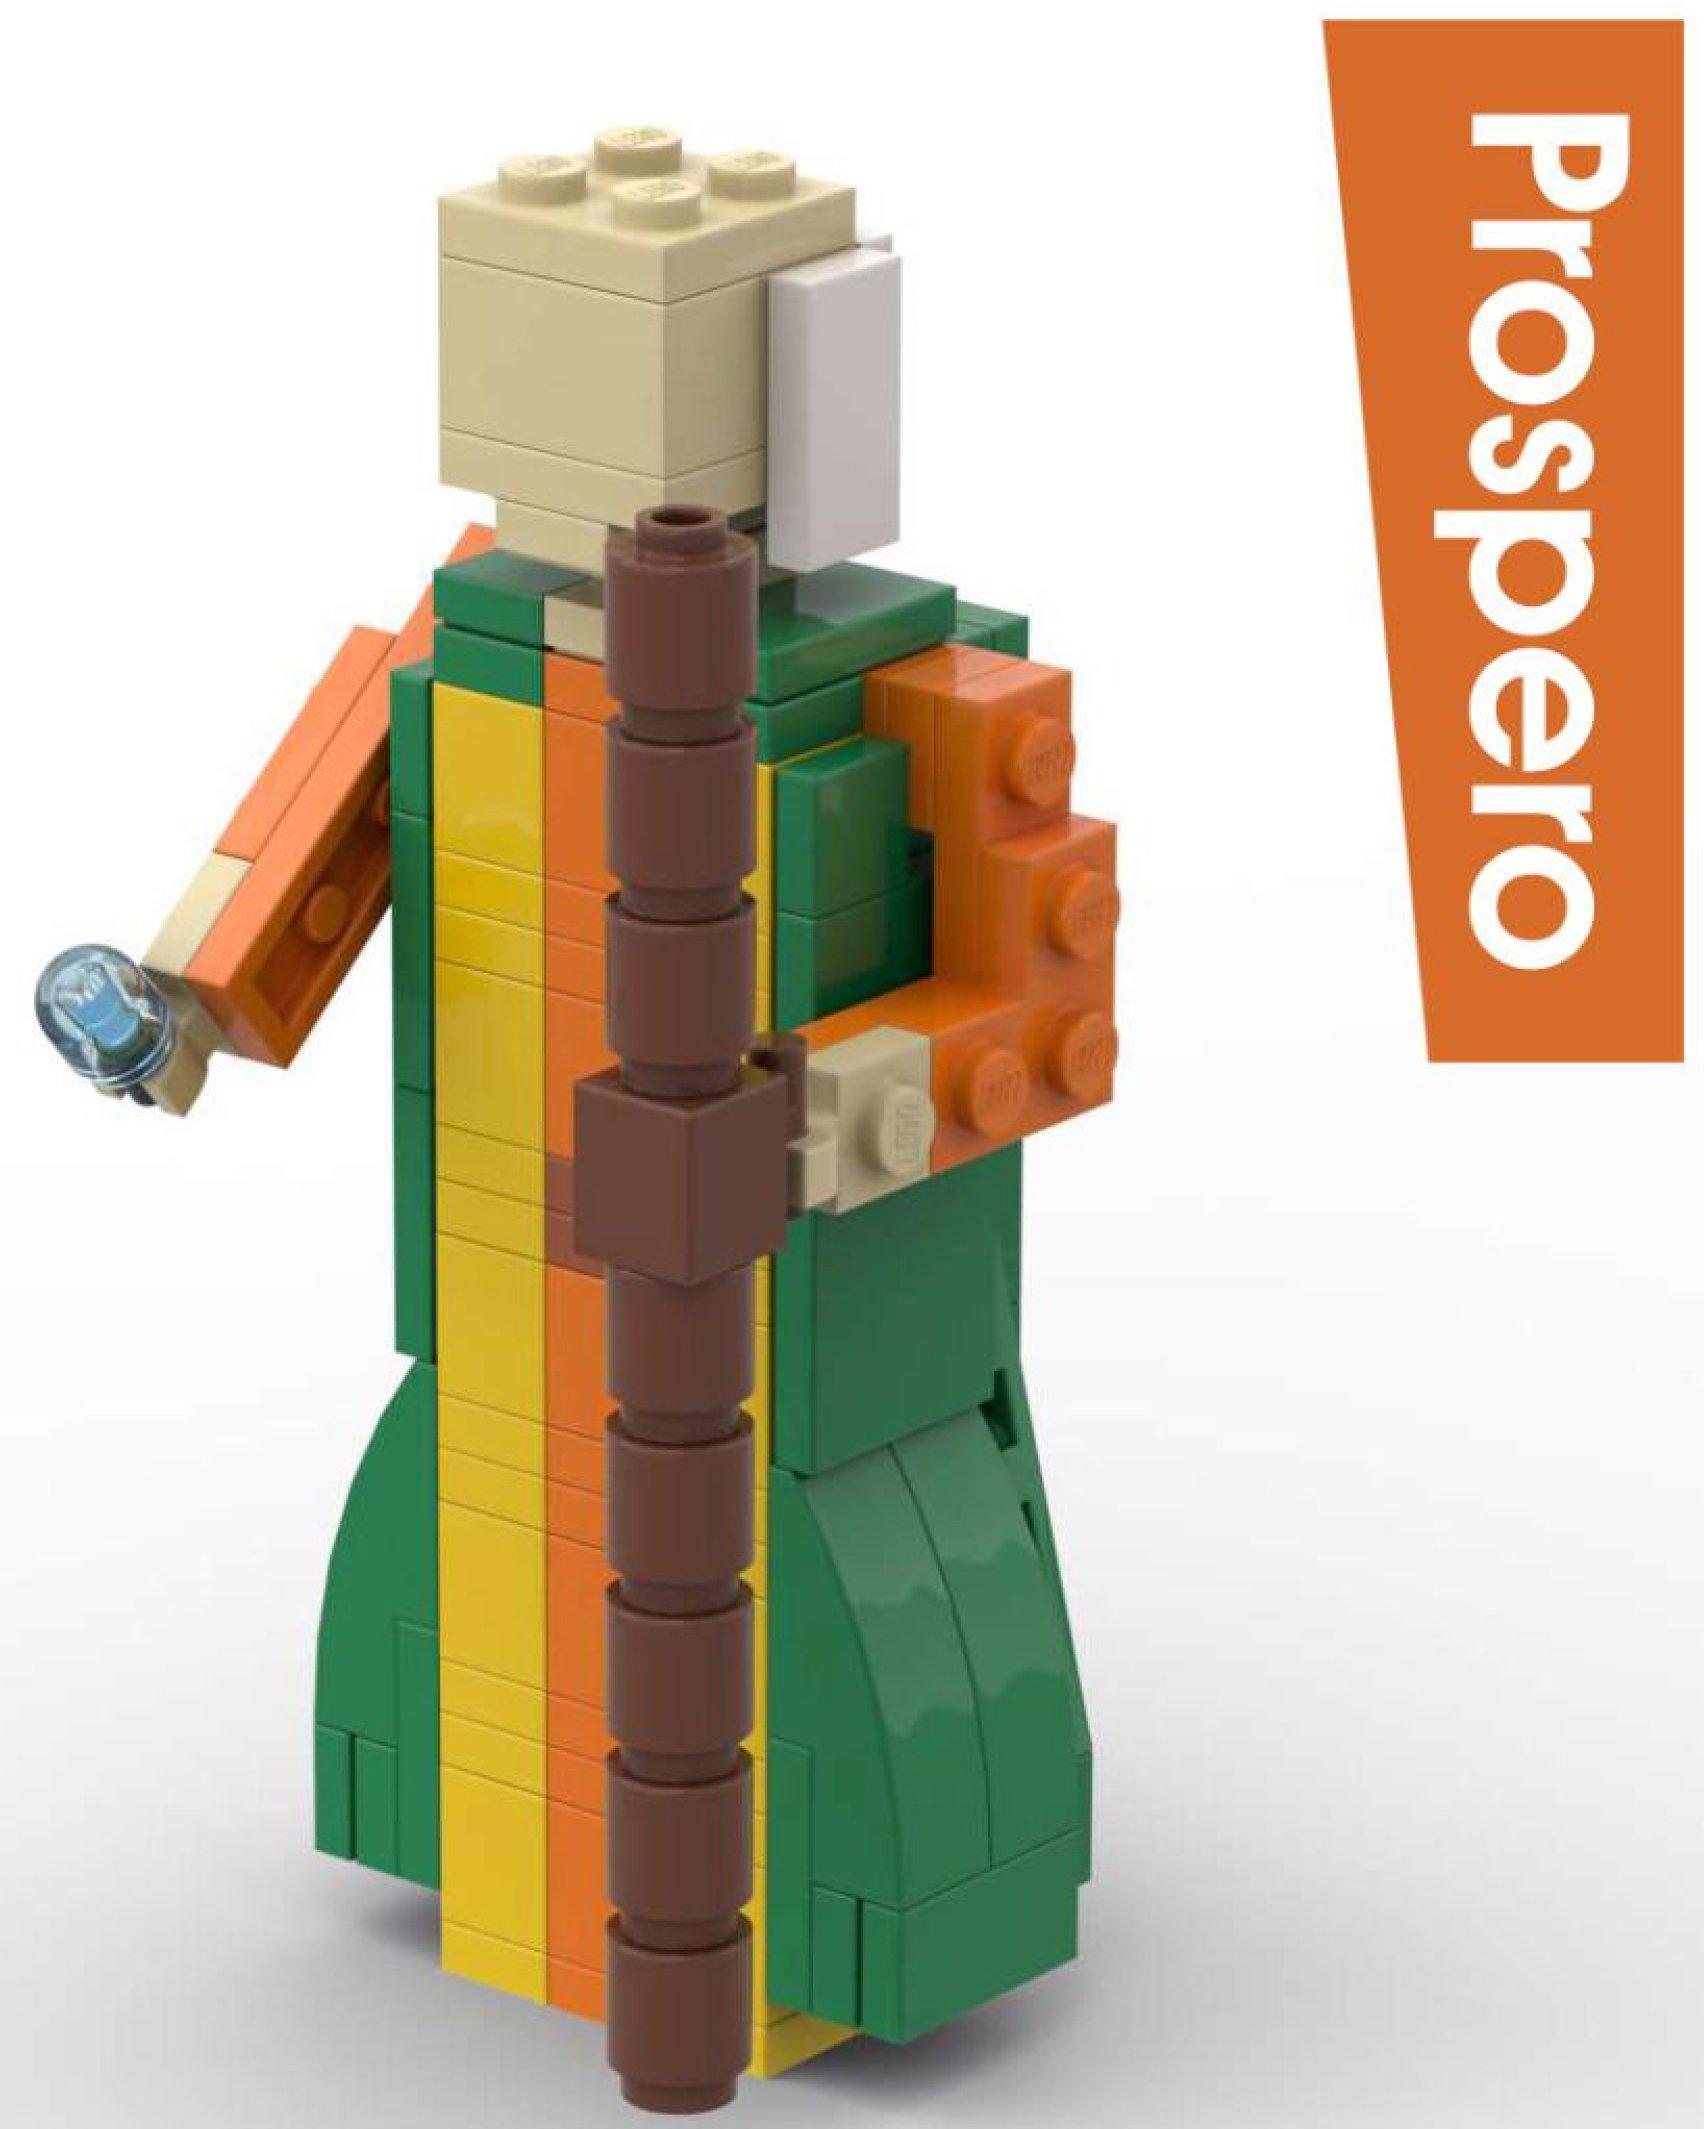 Lego Prospero